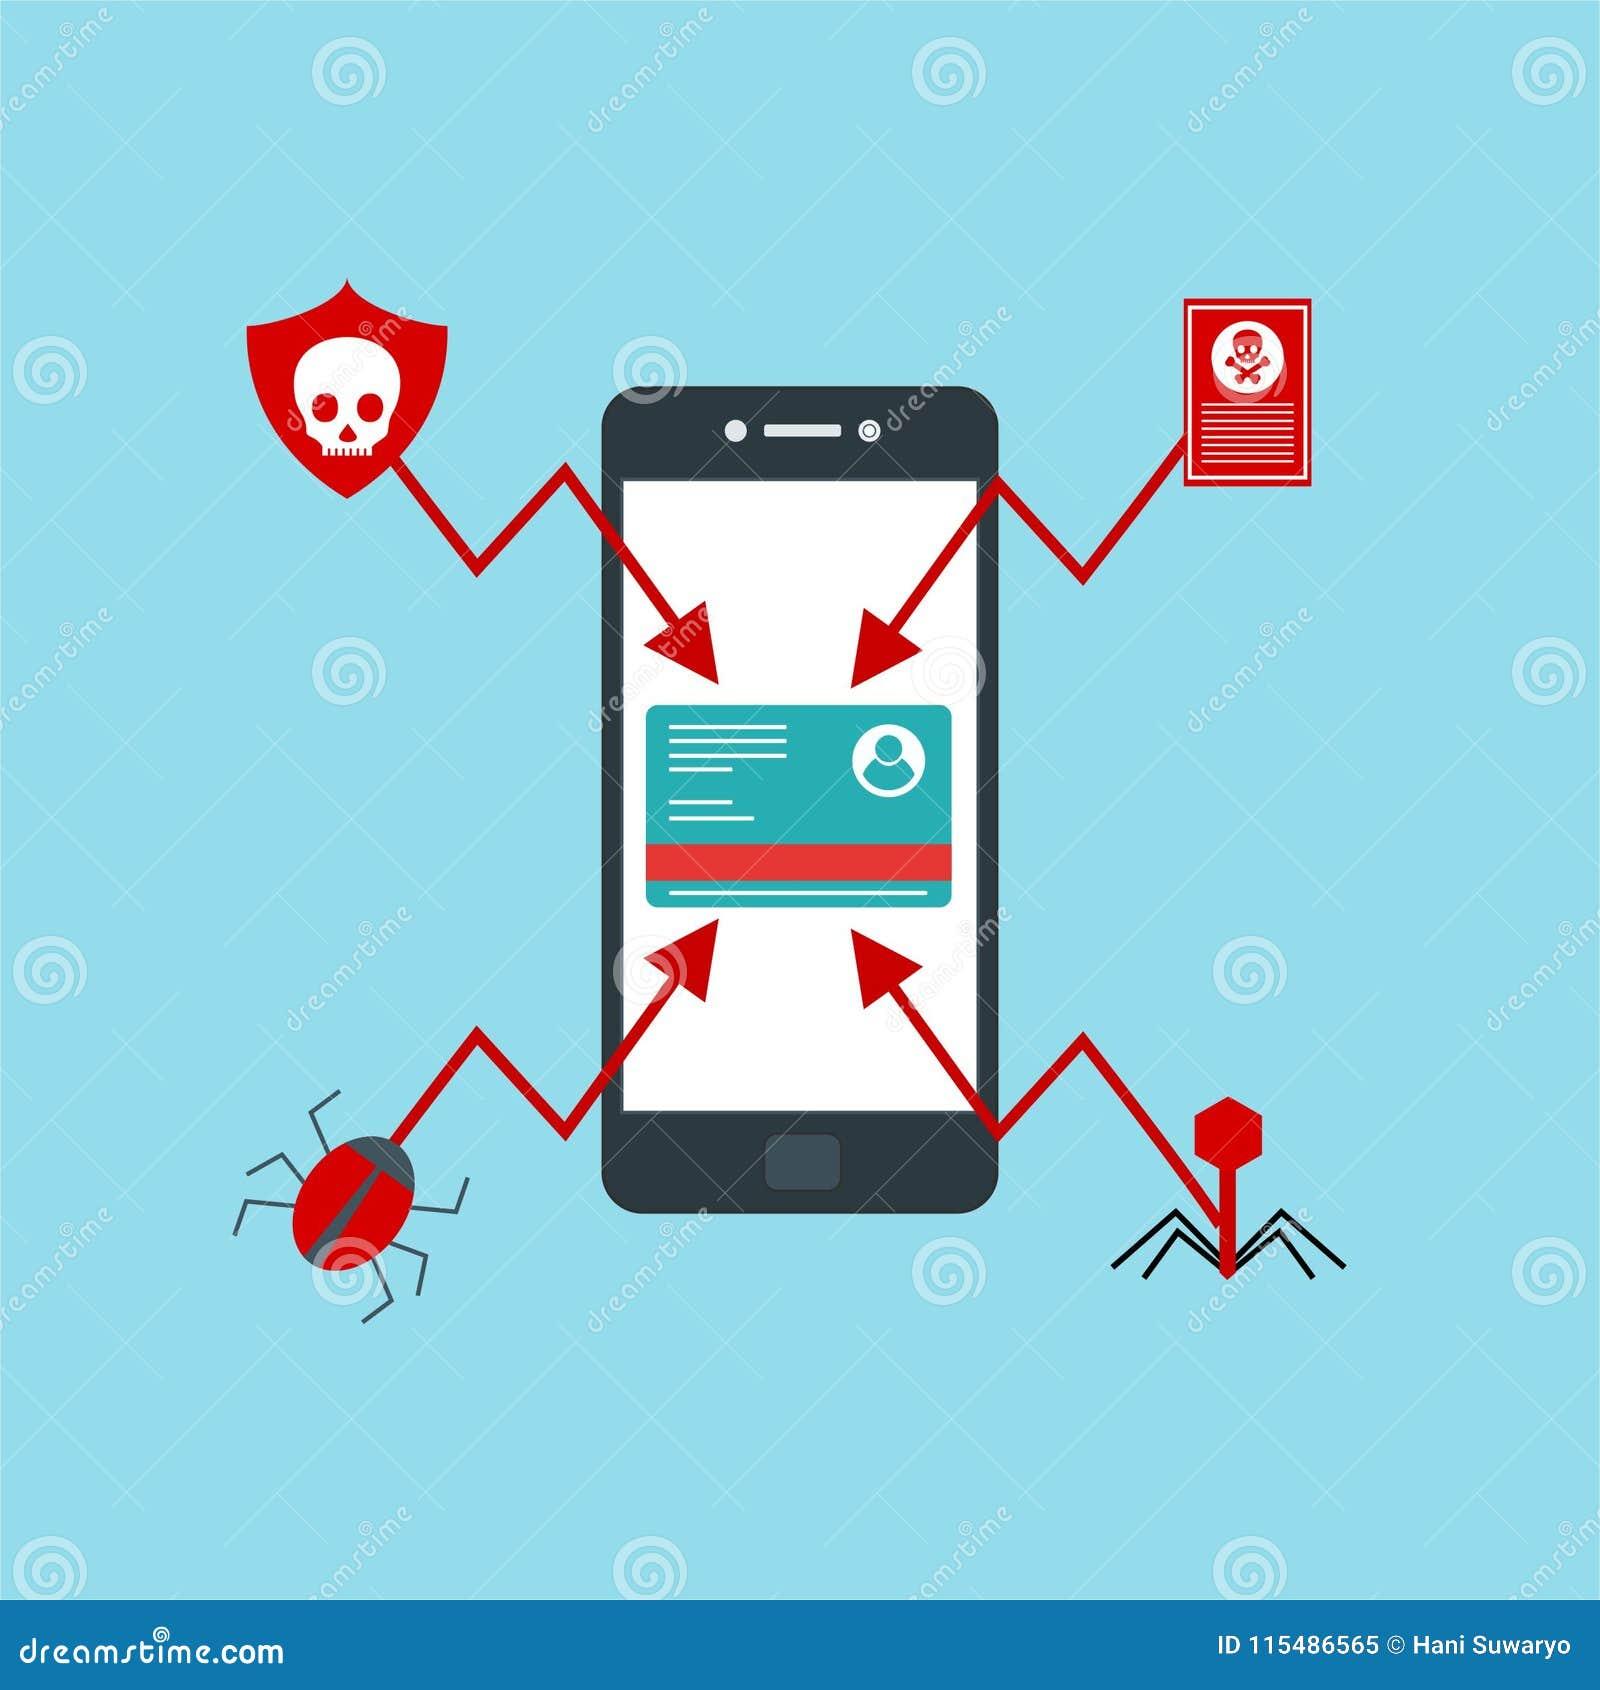 Alert Notification On Smartphone Vector, Malware Concept